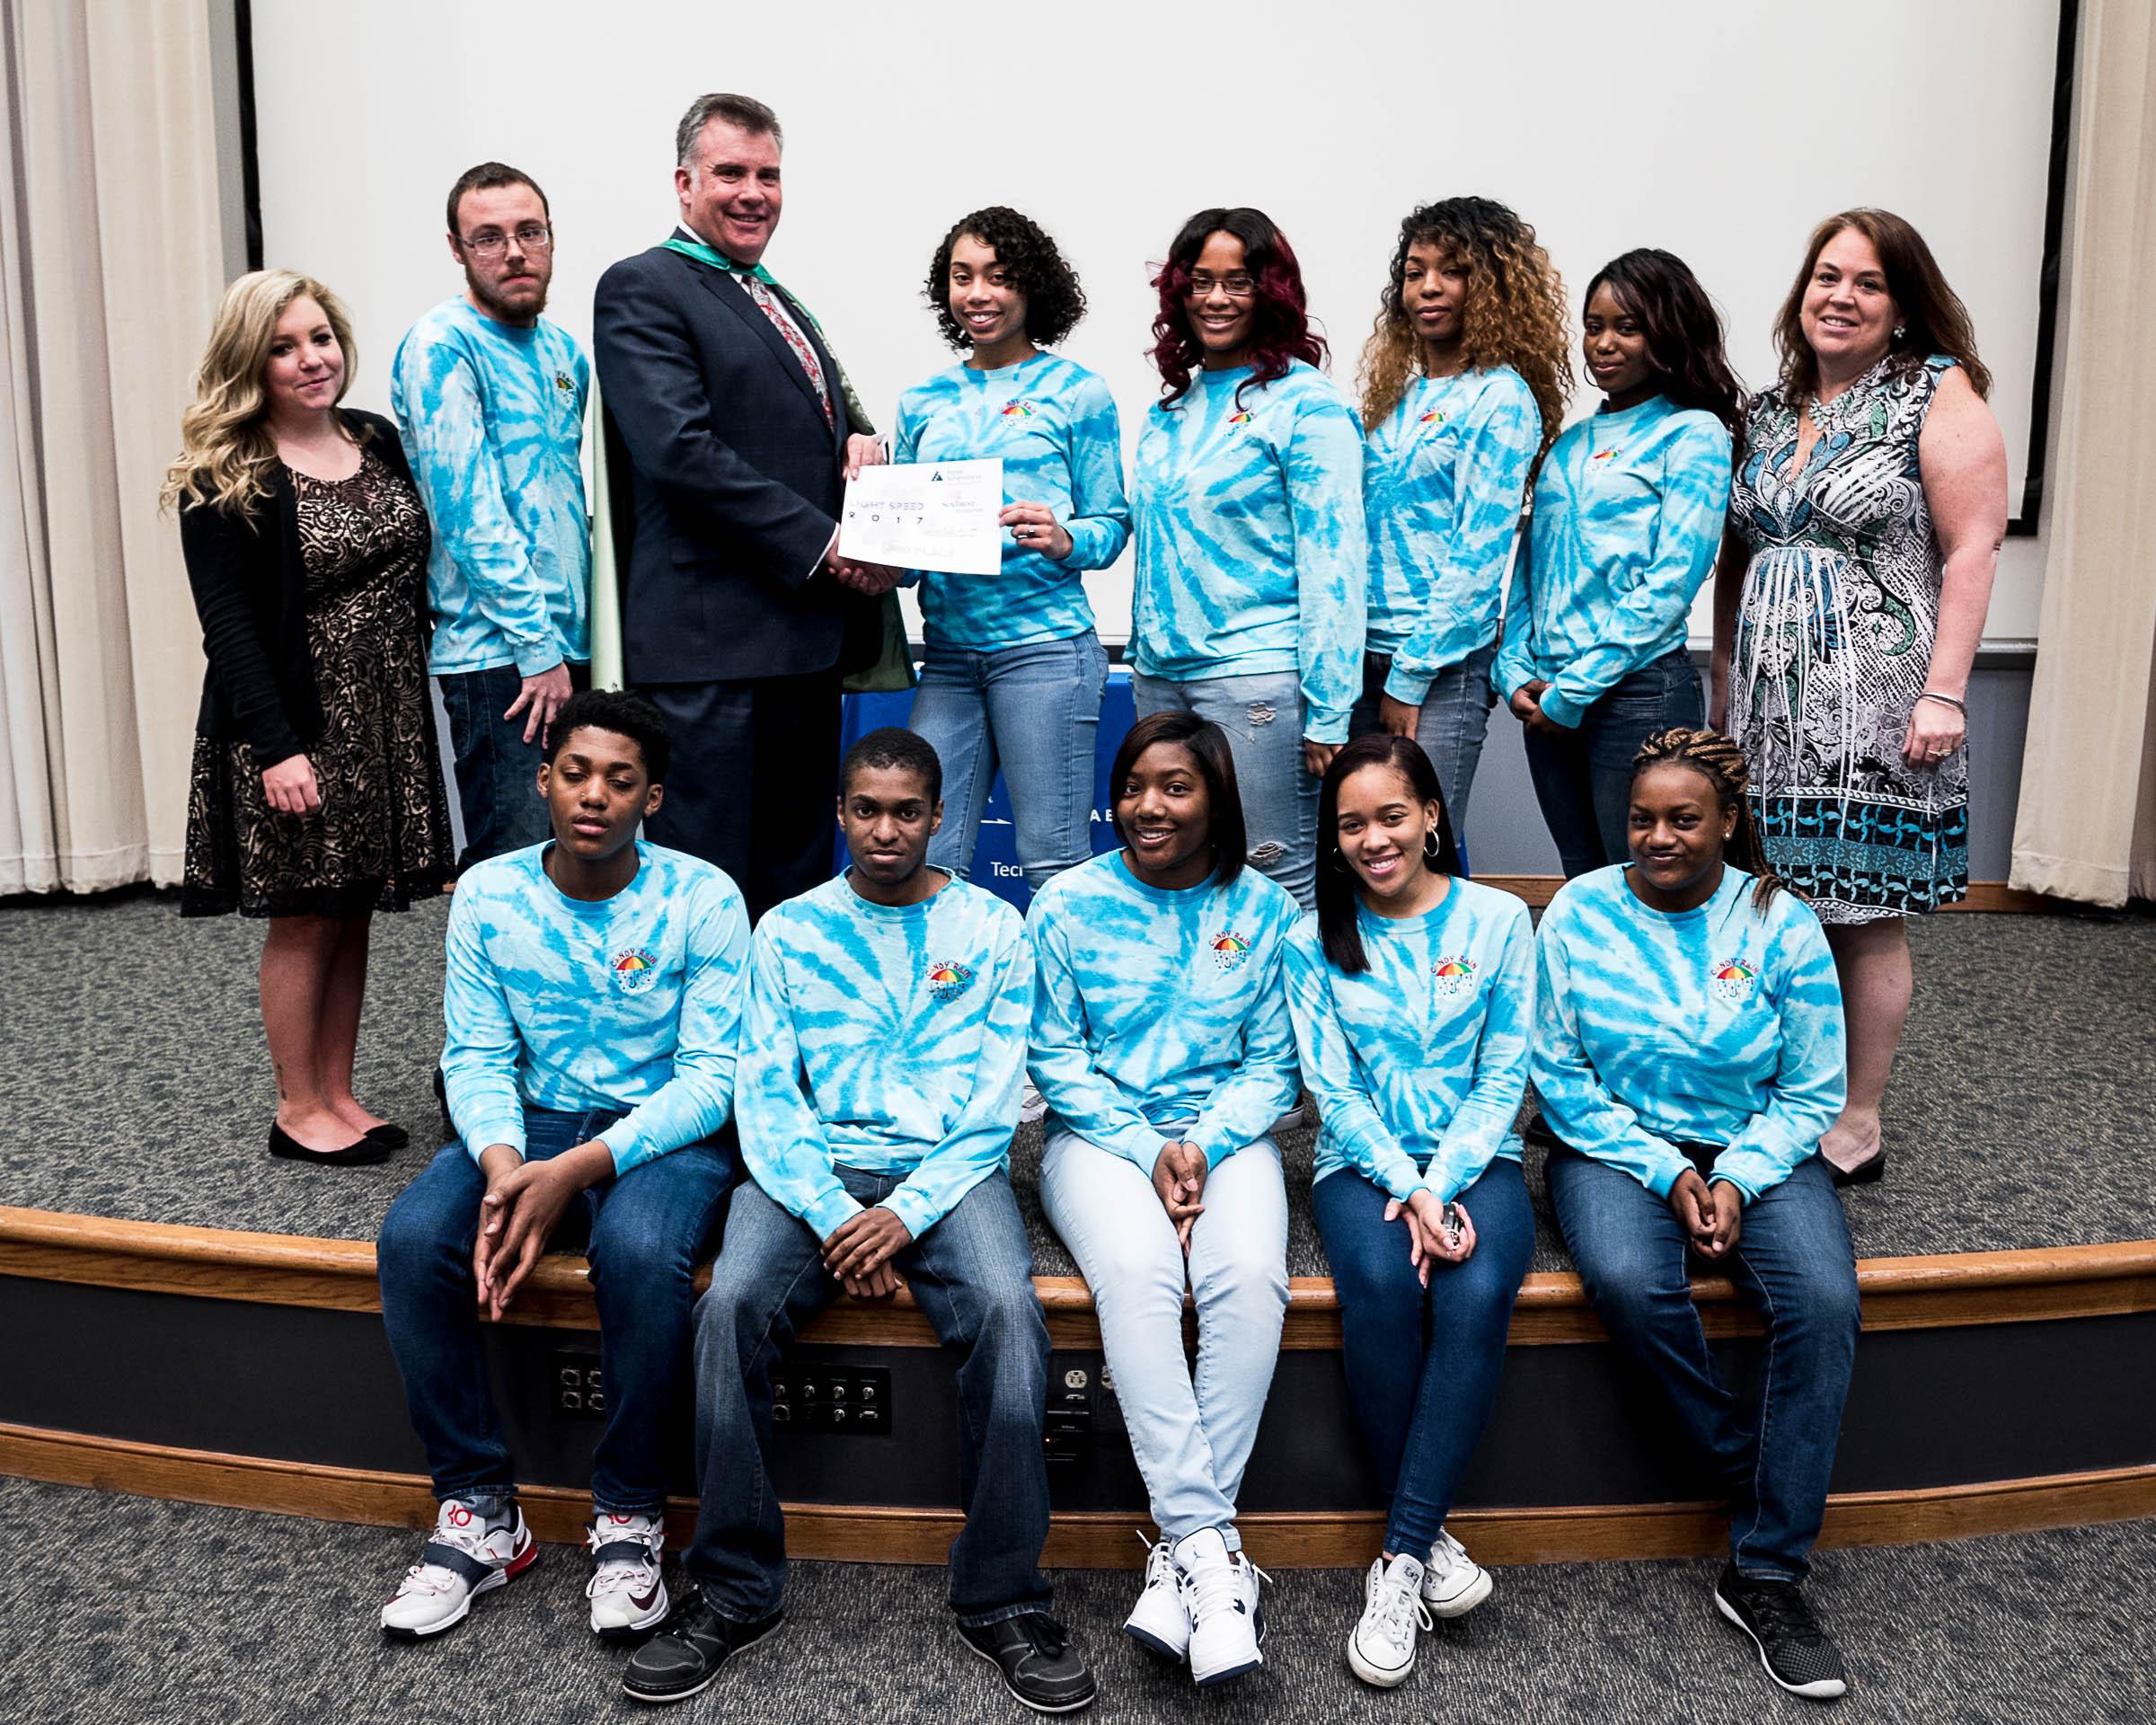 Candy Rain of Green Run High School was Second Runner Up (Pictured with teacher Kerri Sabo, TA Ms. Eubanks, and JA President Frank E. Hughlett).